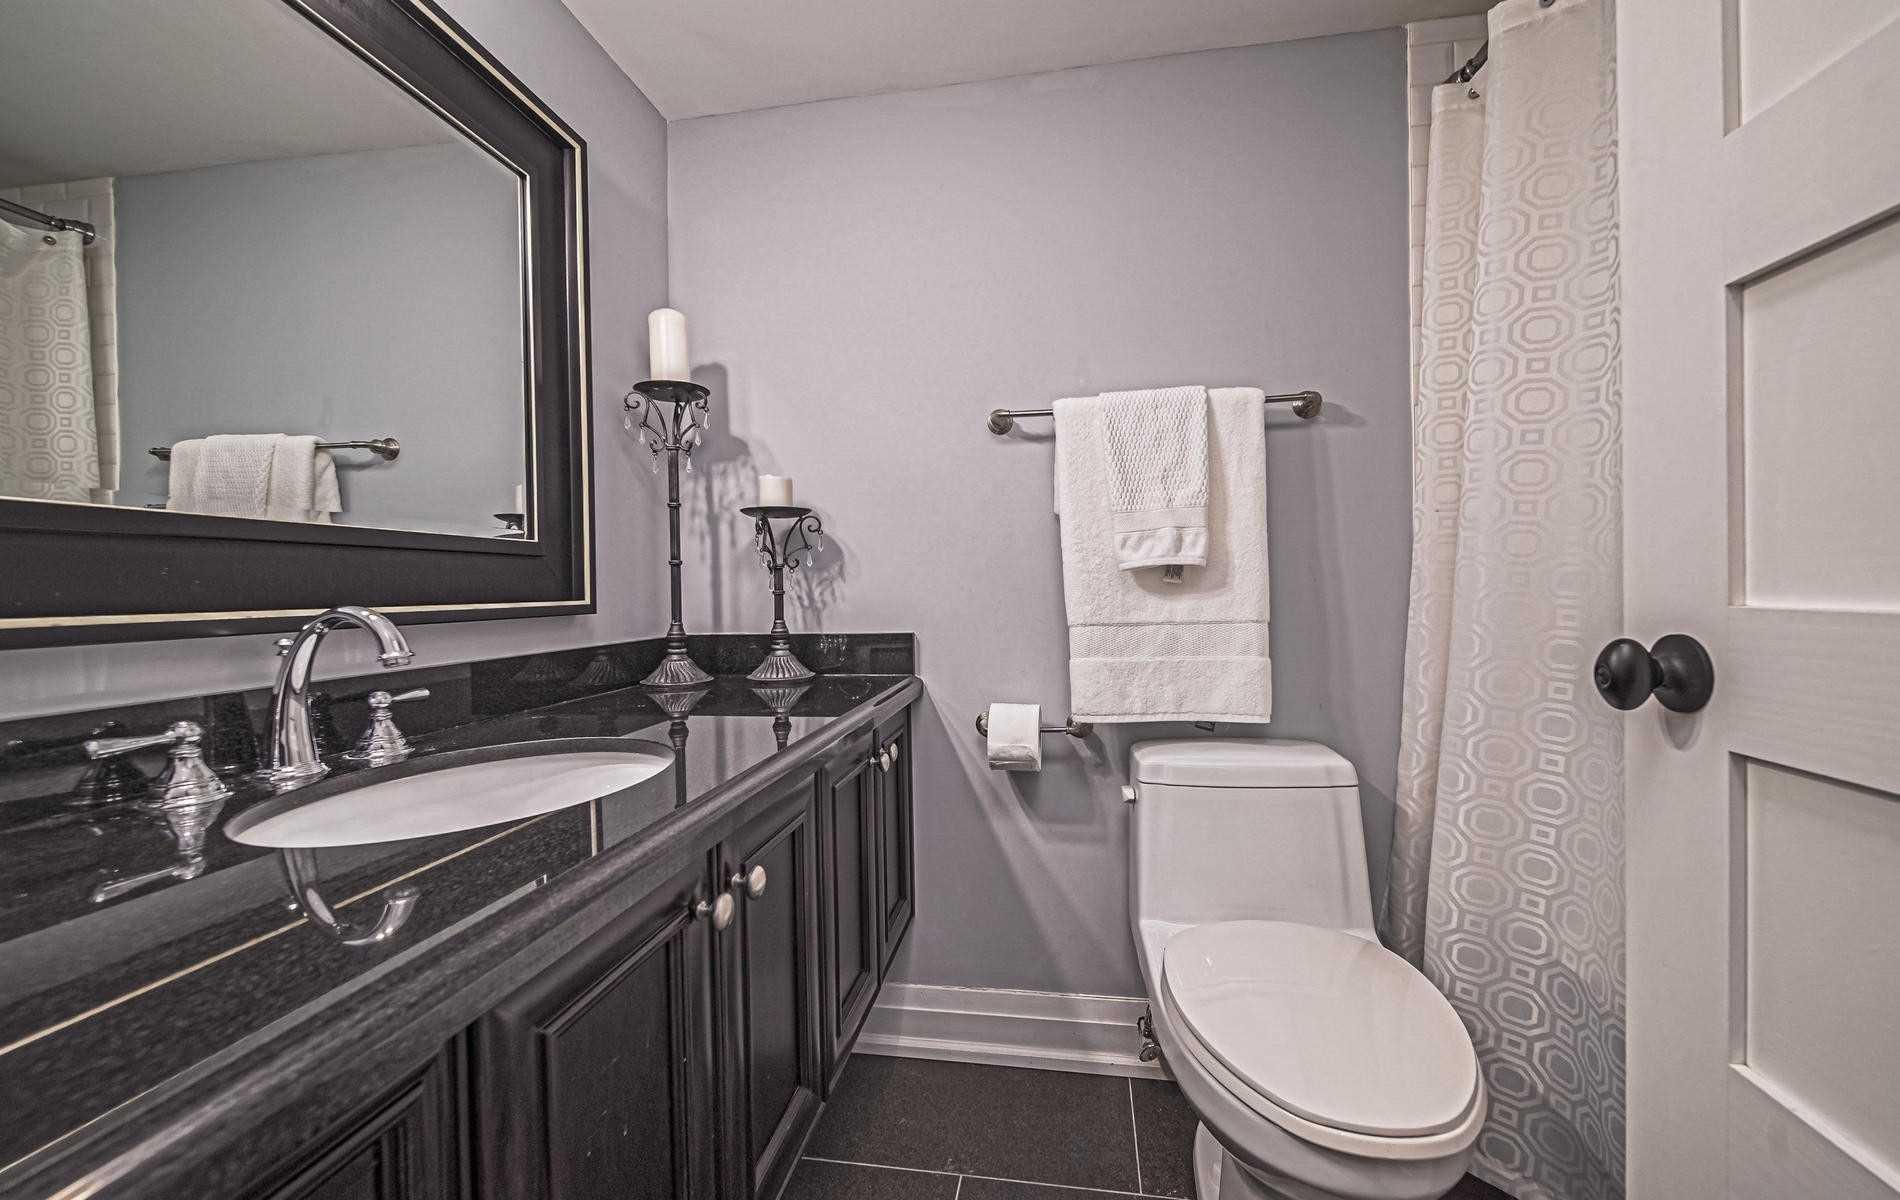 Photo 19: Photos: 216A Hamilton Street in Toronto: South Riverdale House (3-Storey) for sale (Toronto E01)  : MLS®# E4619870